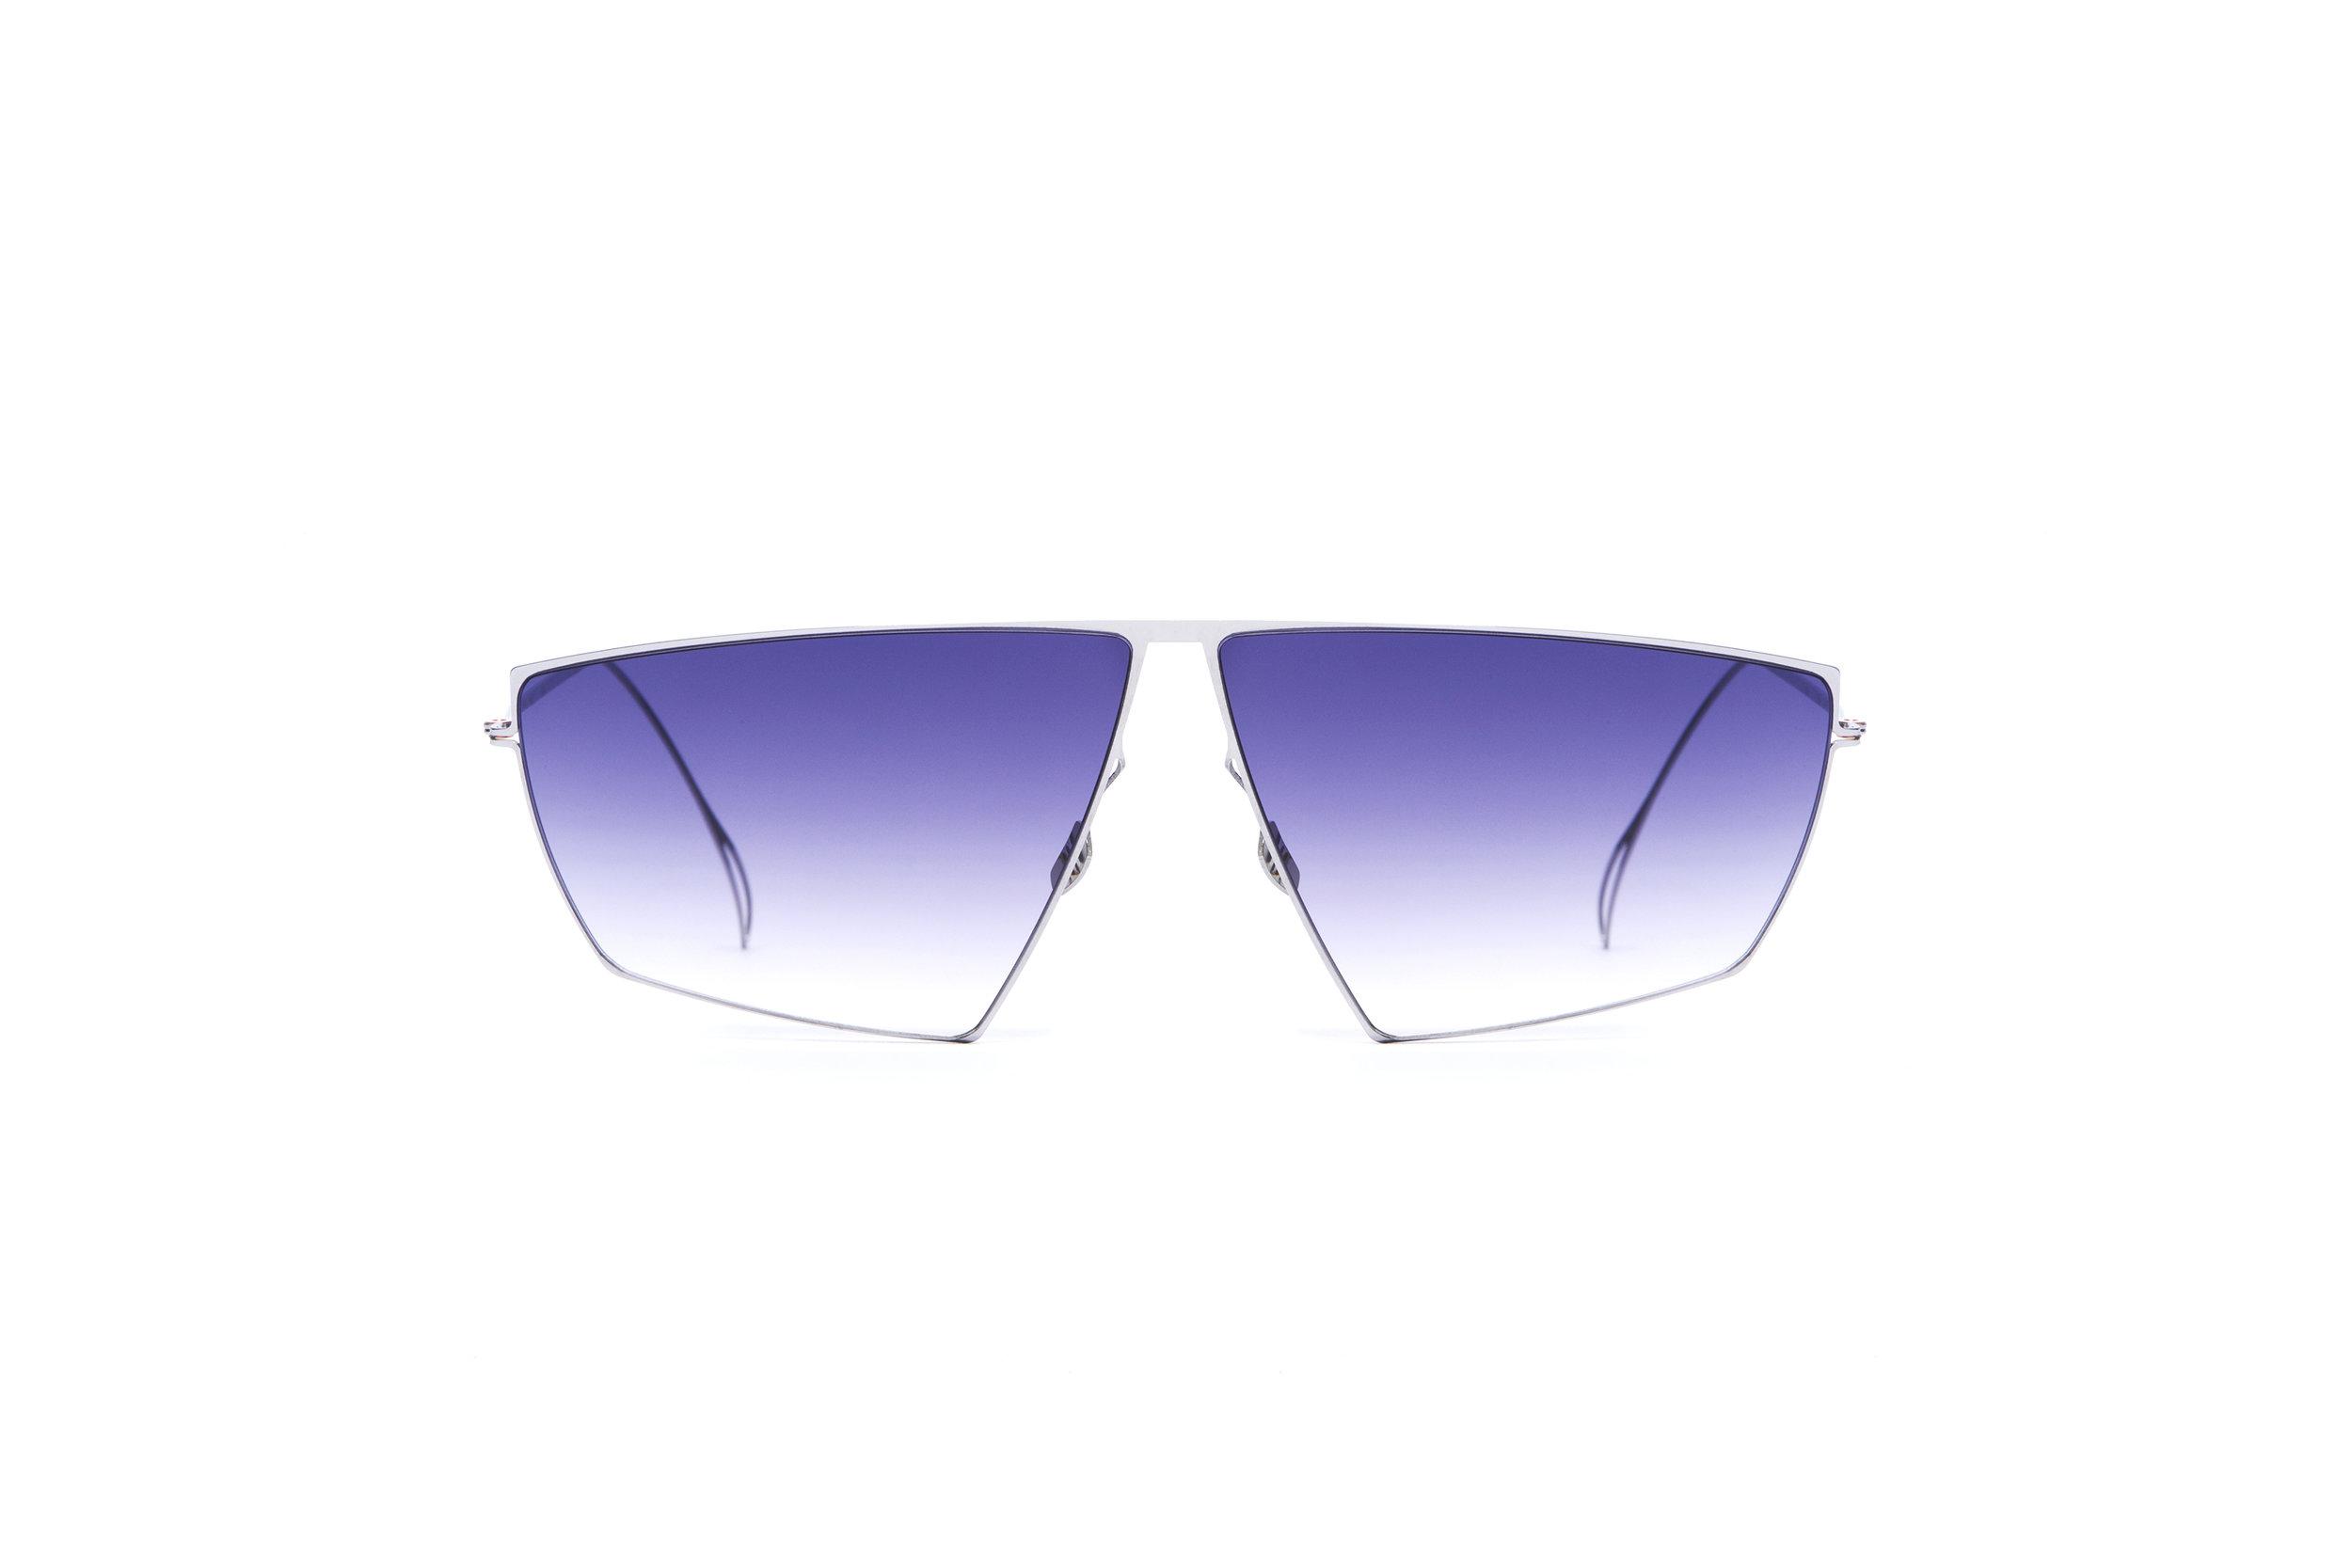 haffmans_neumeister_typhus_silver_purplerain_gradient_ultralight_sunglasses_front_102438.jpg